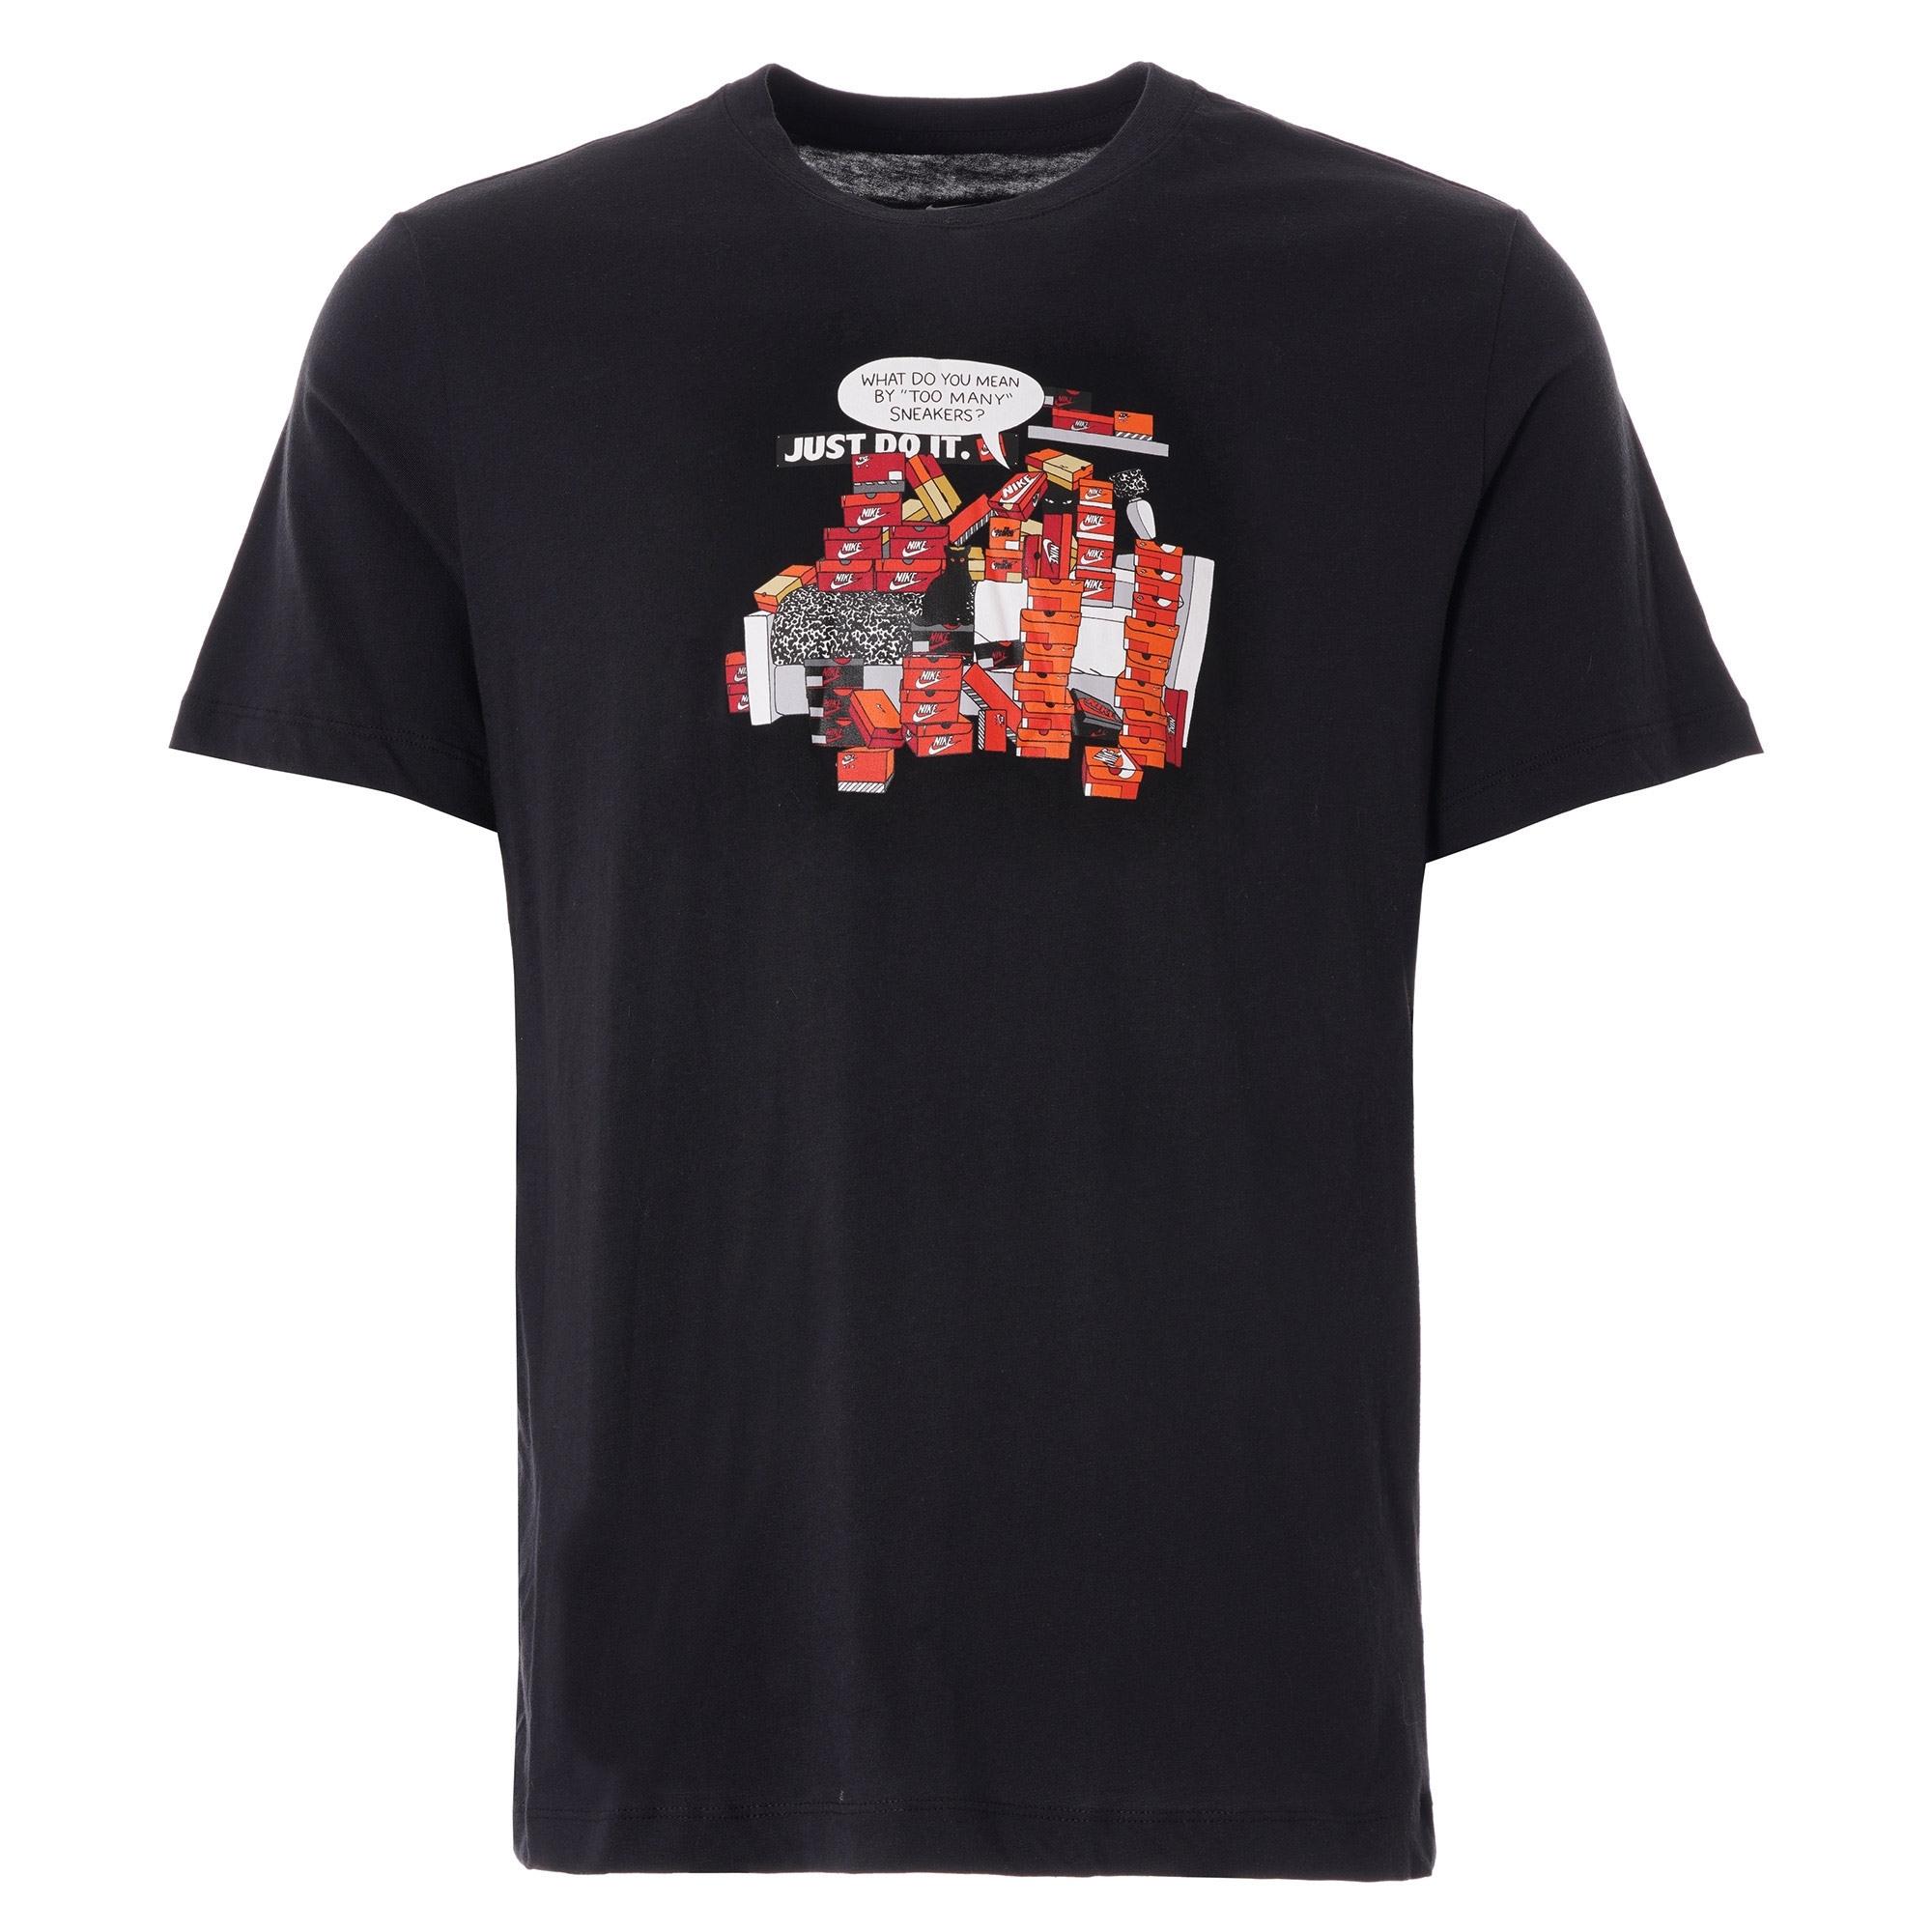 Nike Sneaker Culture Tshirt  Black  Ck2661010